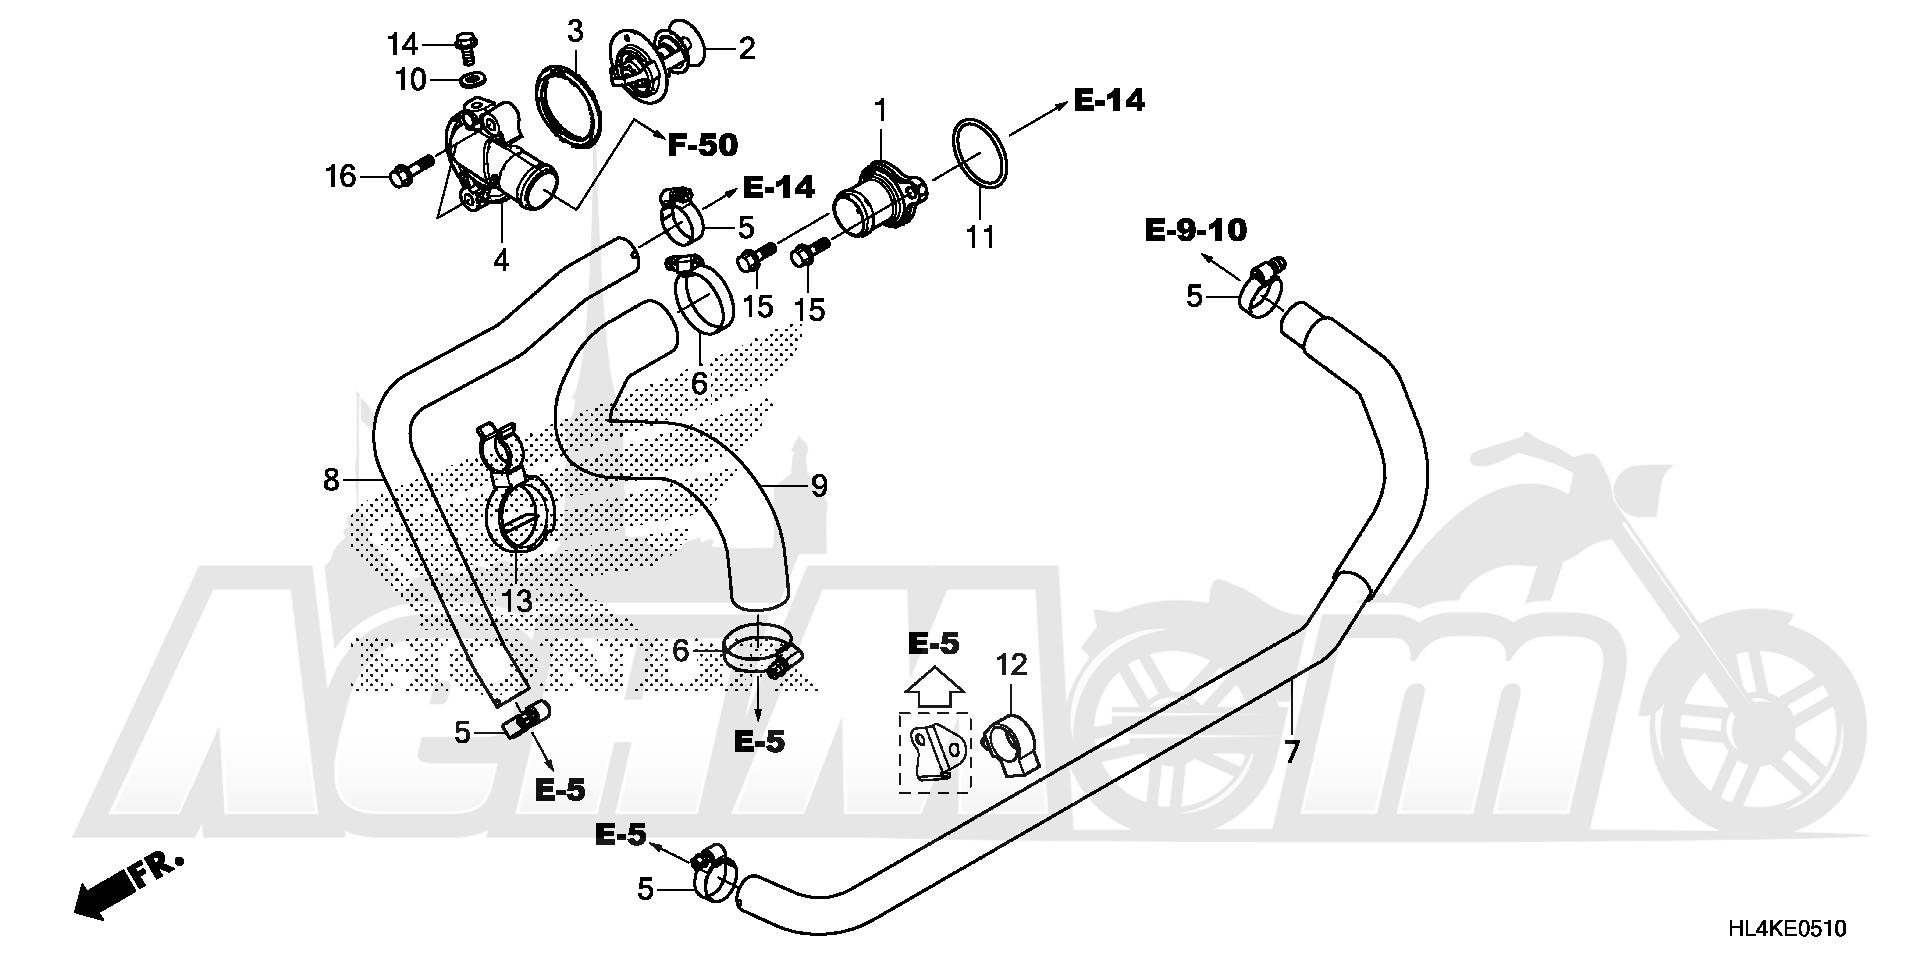 Запчасти для Квадроцикла Honda 2019 SXS1000M3P Раздел: WATER HOSE AND THERMOSTAT | вода шланг и термостат